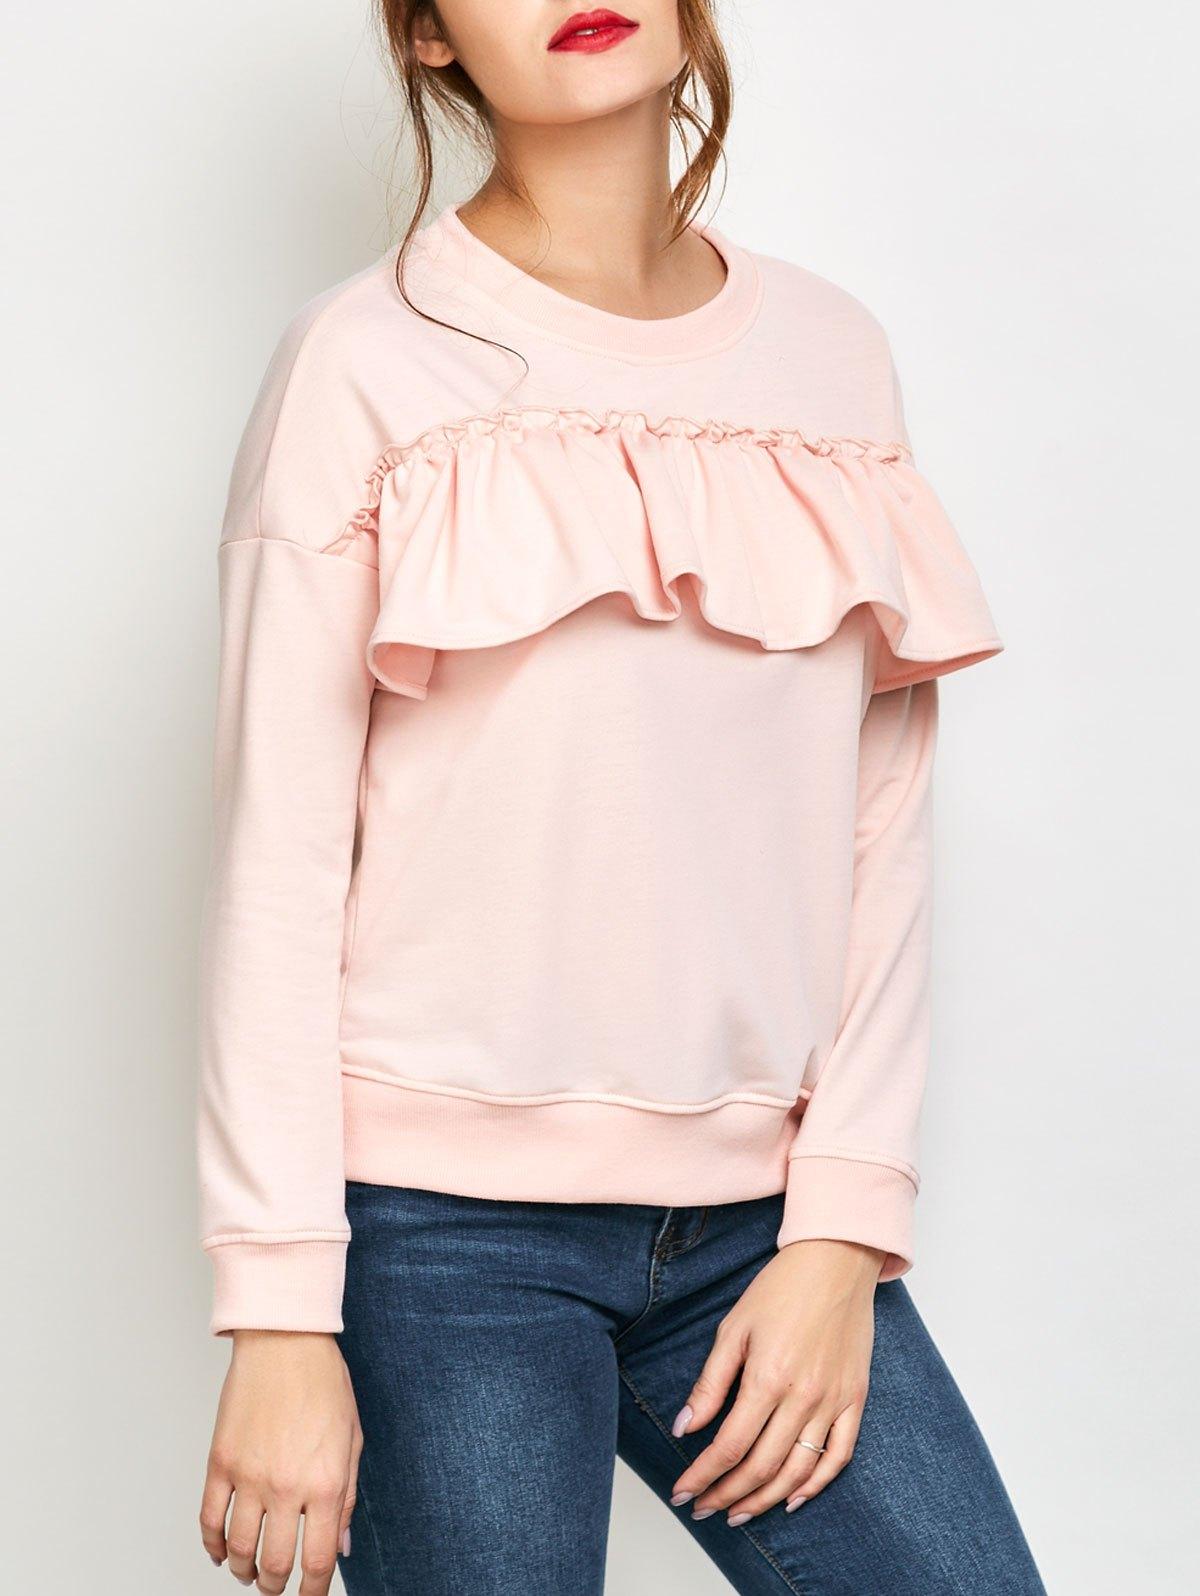 Jewel Neck Ruffles Sweatshirt